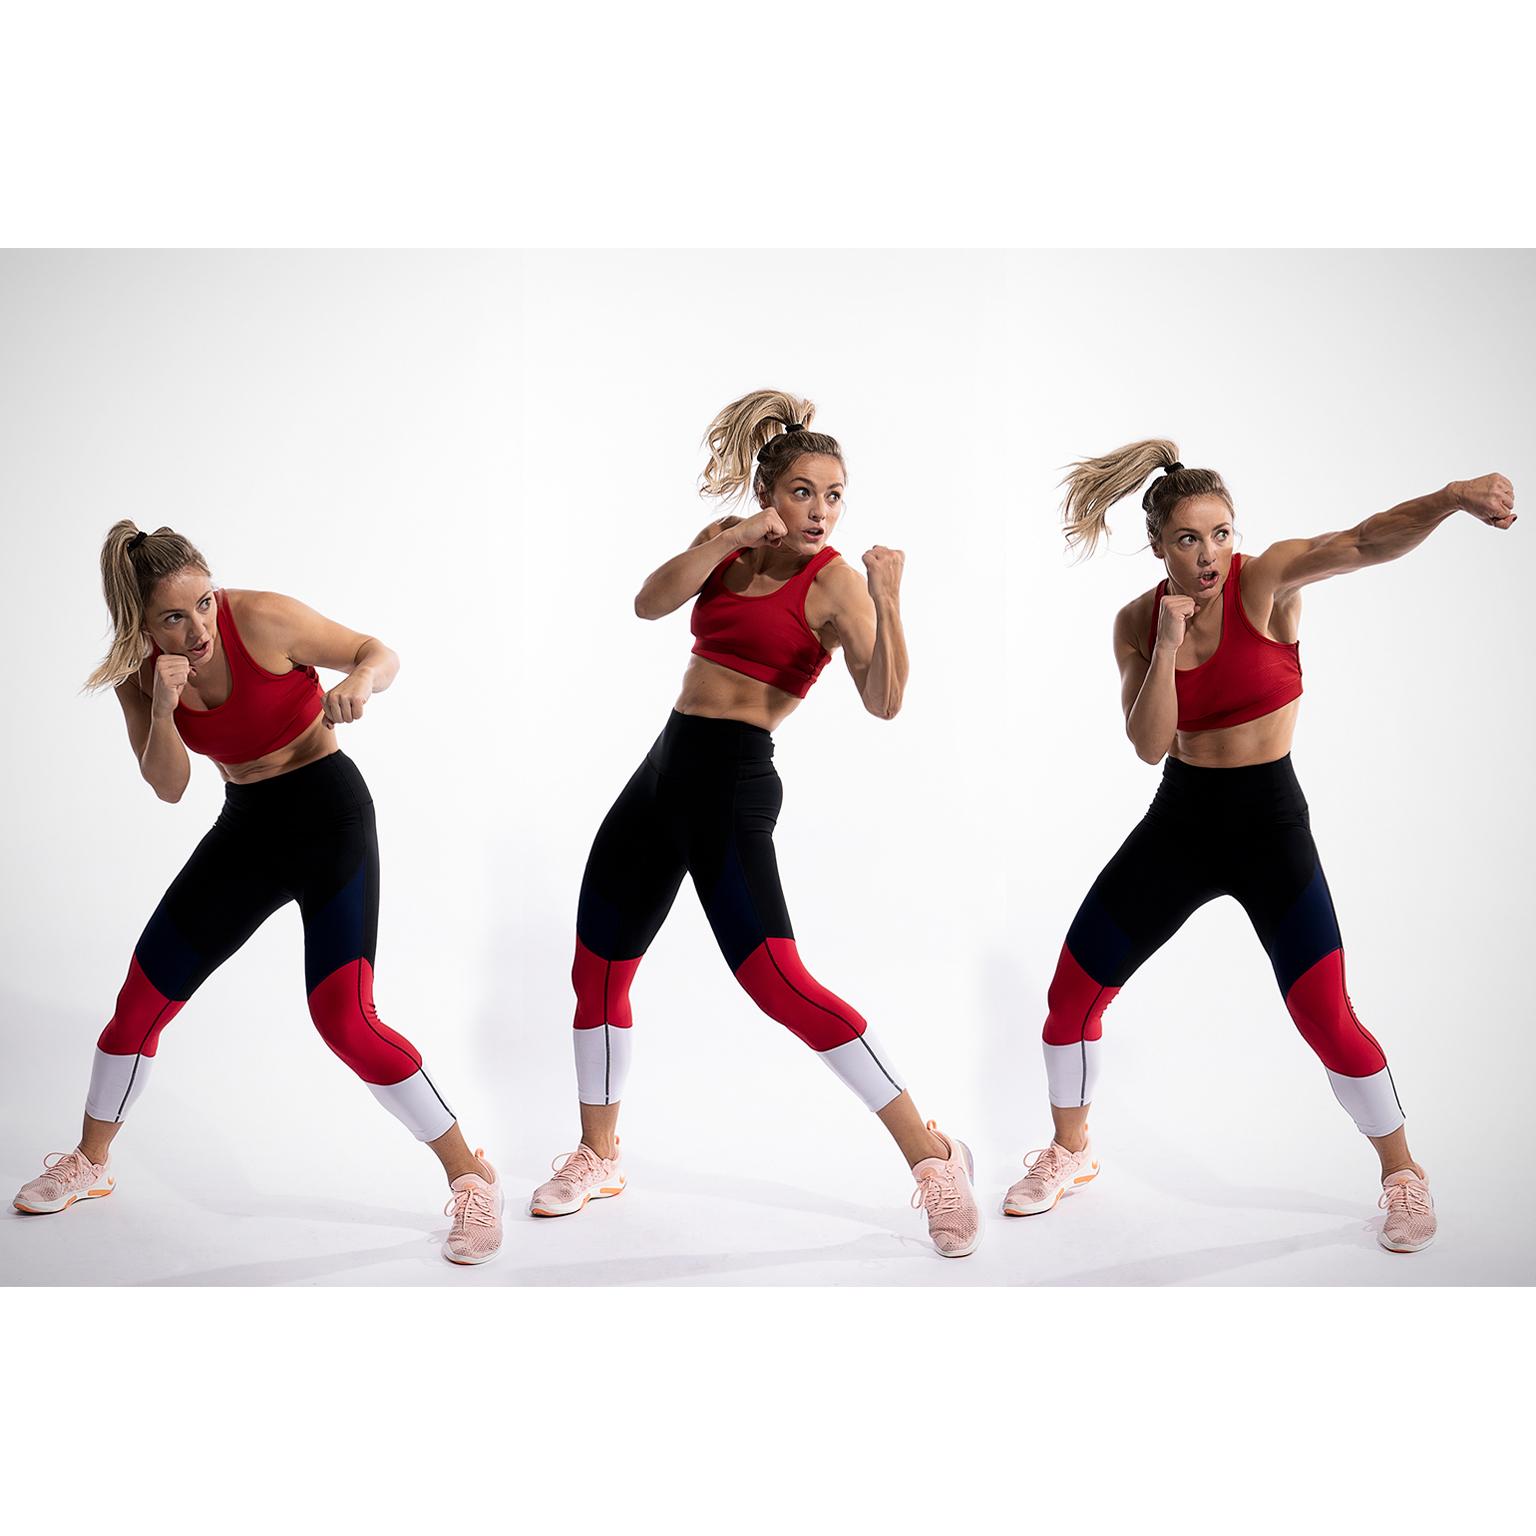 Toronto-Fitness-Model-Agency-Boxing-Leslie-Bonniveau